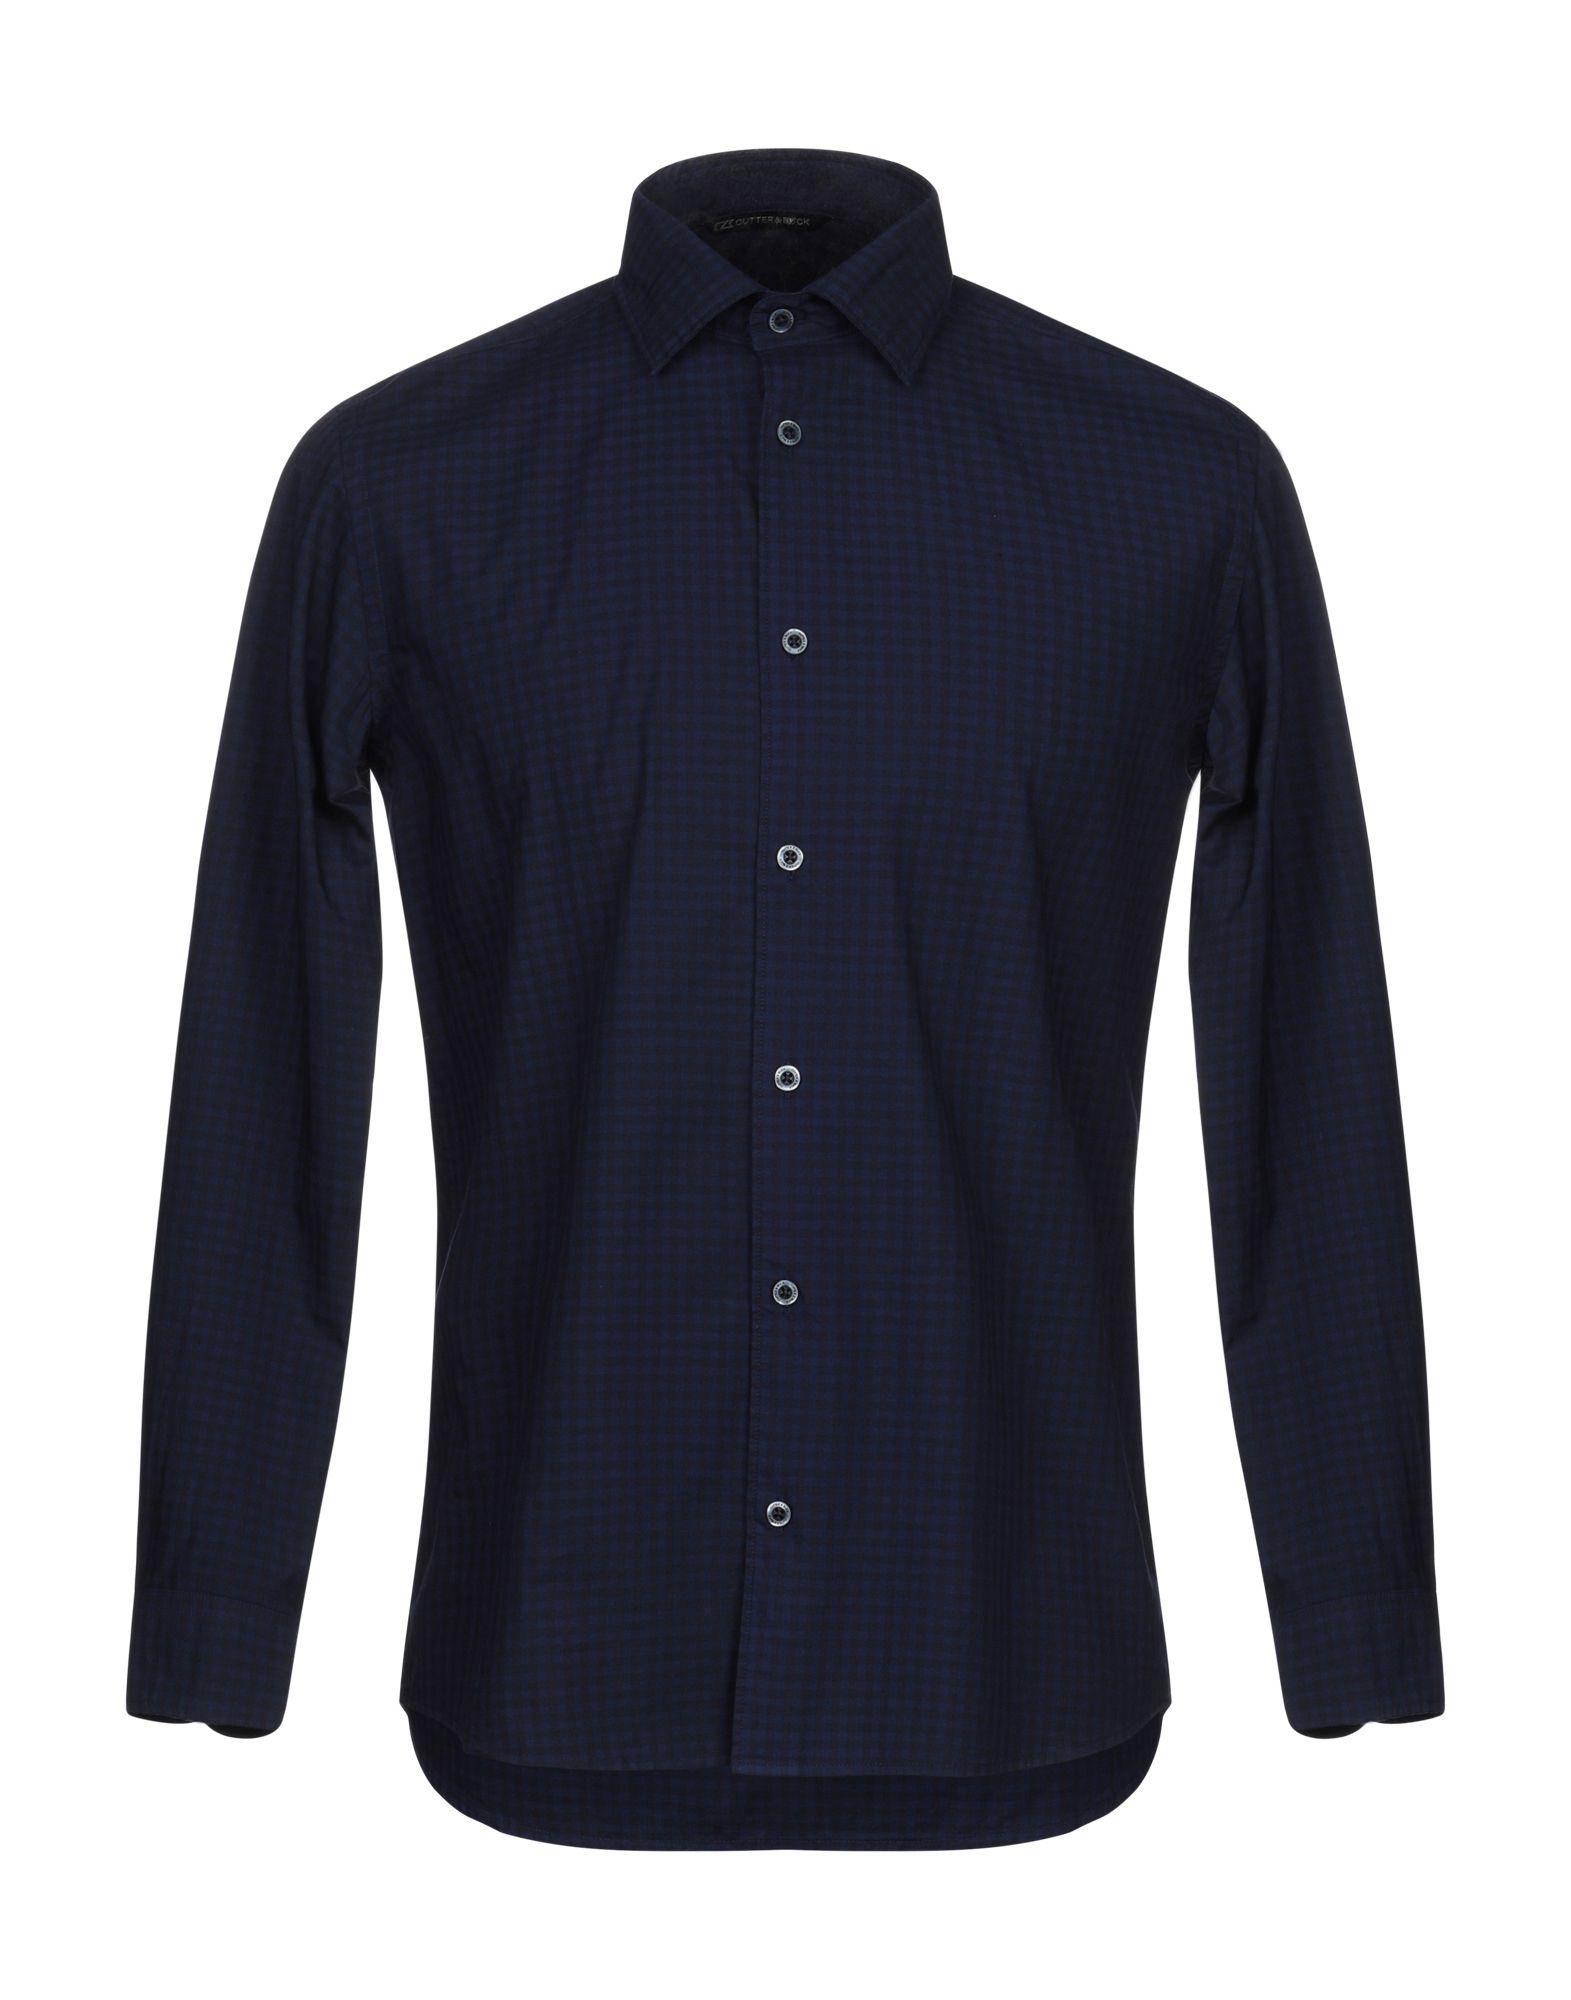 CUTTER & BUCK Shirts. plain weave, no appliqués, checked, front closure, button closing, long sleeves, buttoned cuffs, classic neckline, no pockets. 100% Cotton